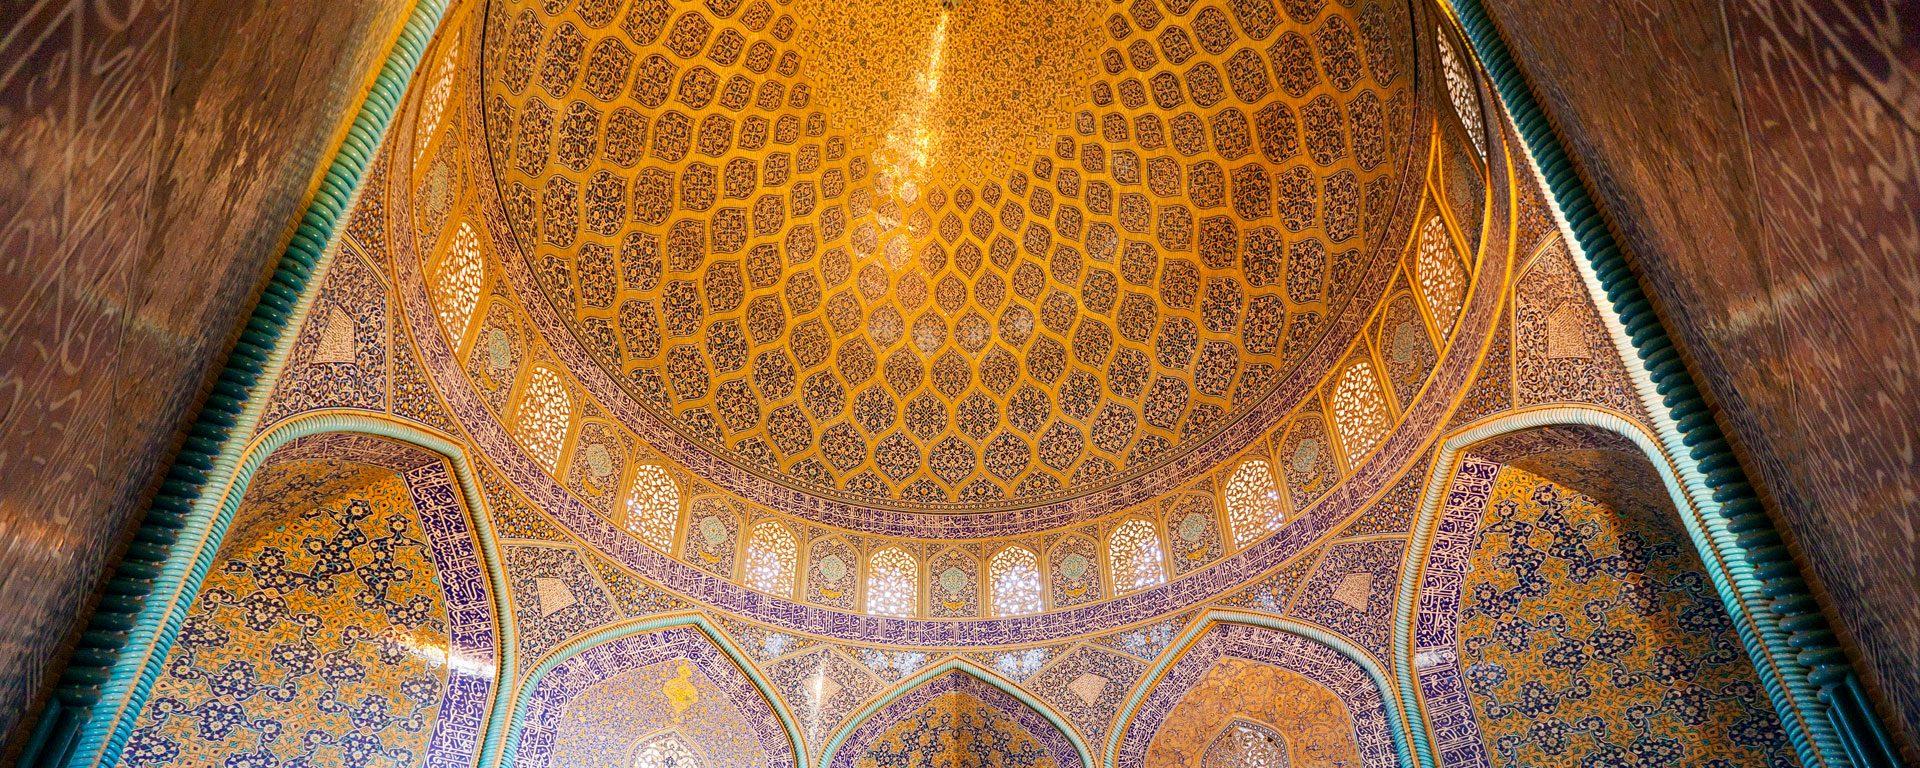 The golden interior dome of the Sheikh Lotfollah Mosque in Esfahan, Iran